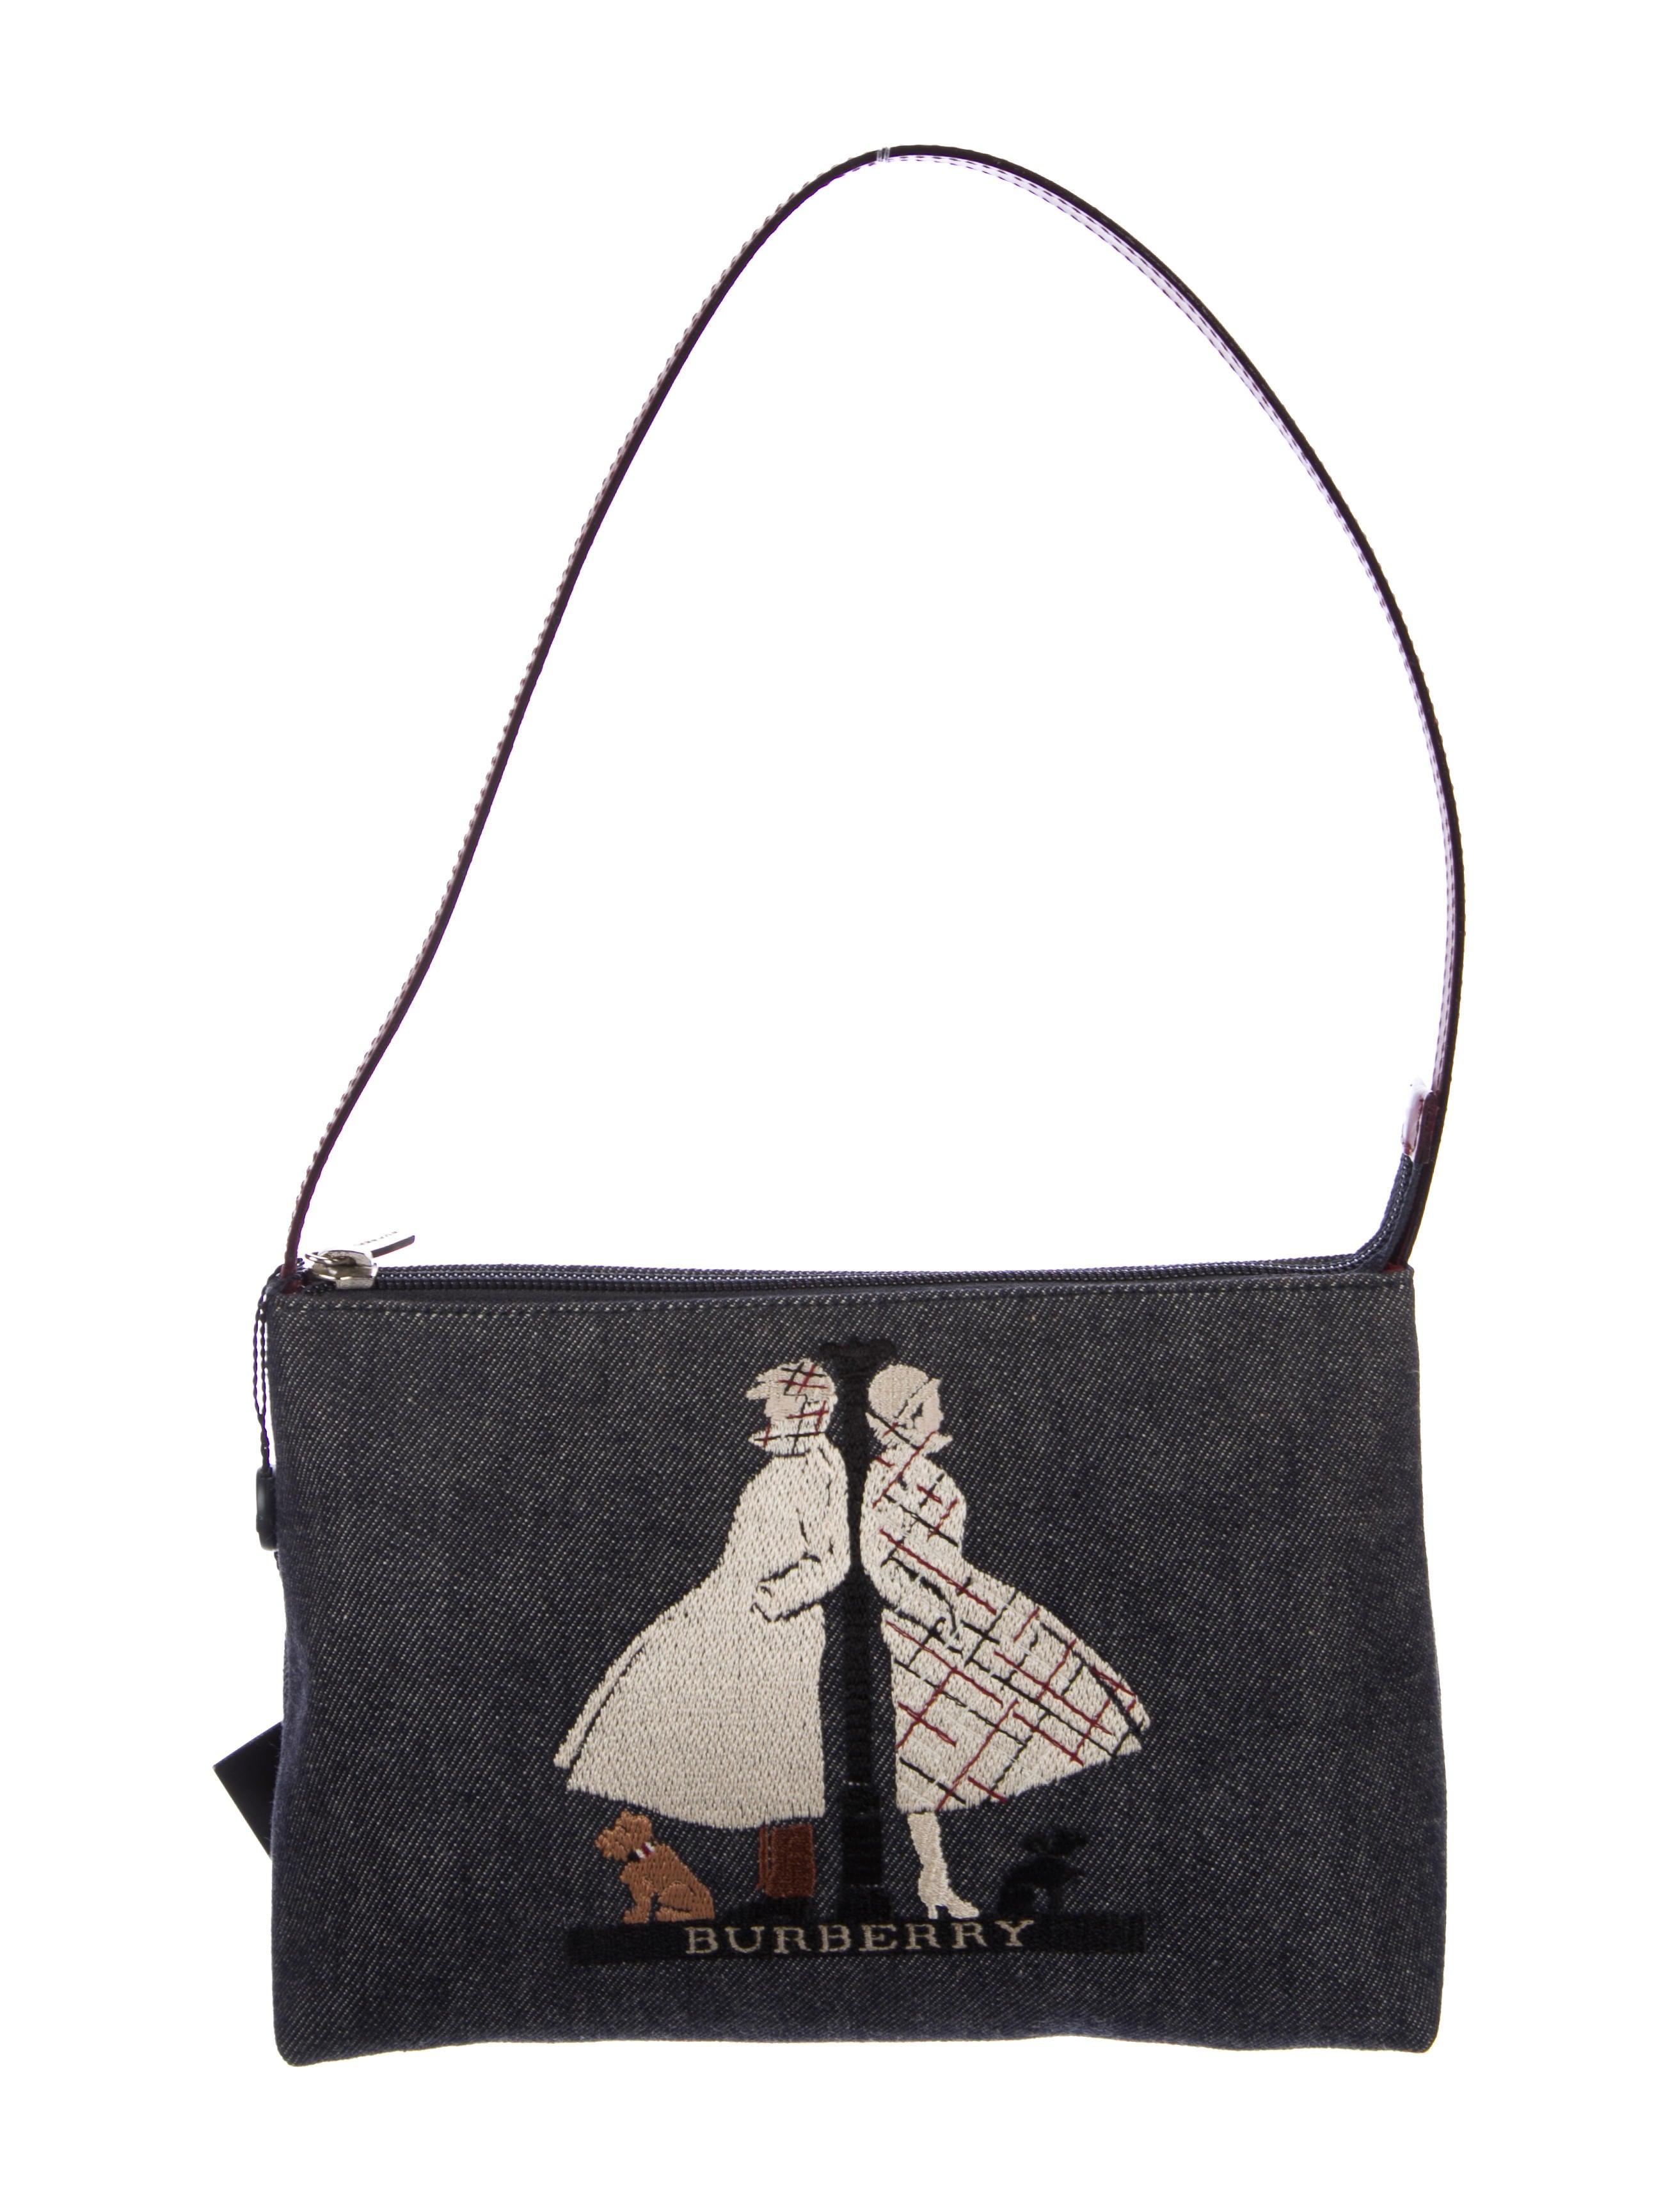 Burberry london embroidered denim bag handbags